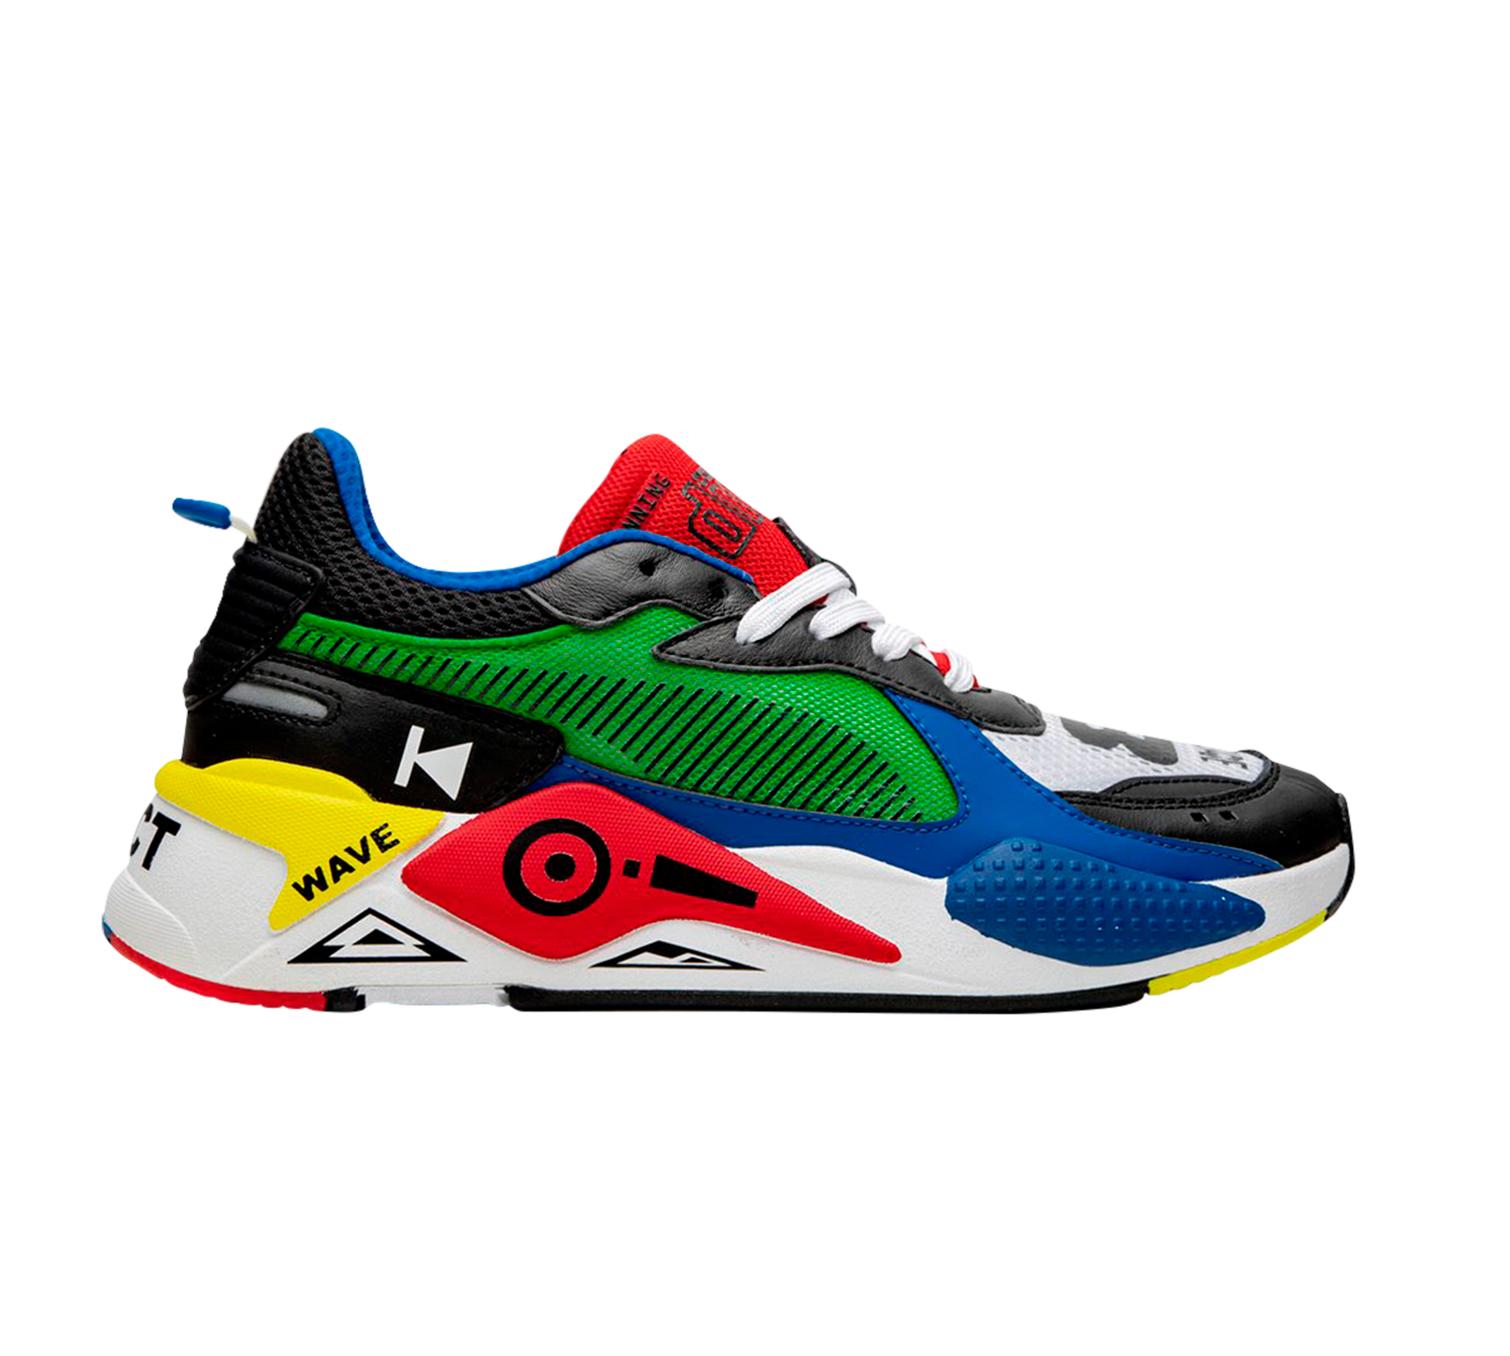 sneakers02_revistamine_interior